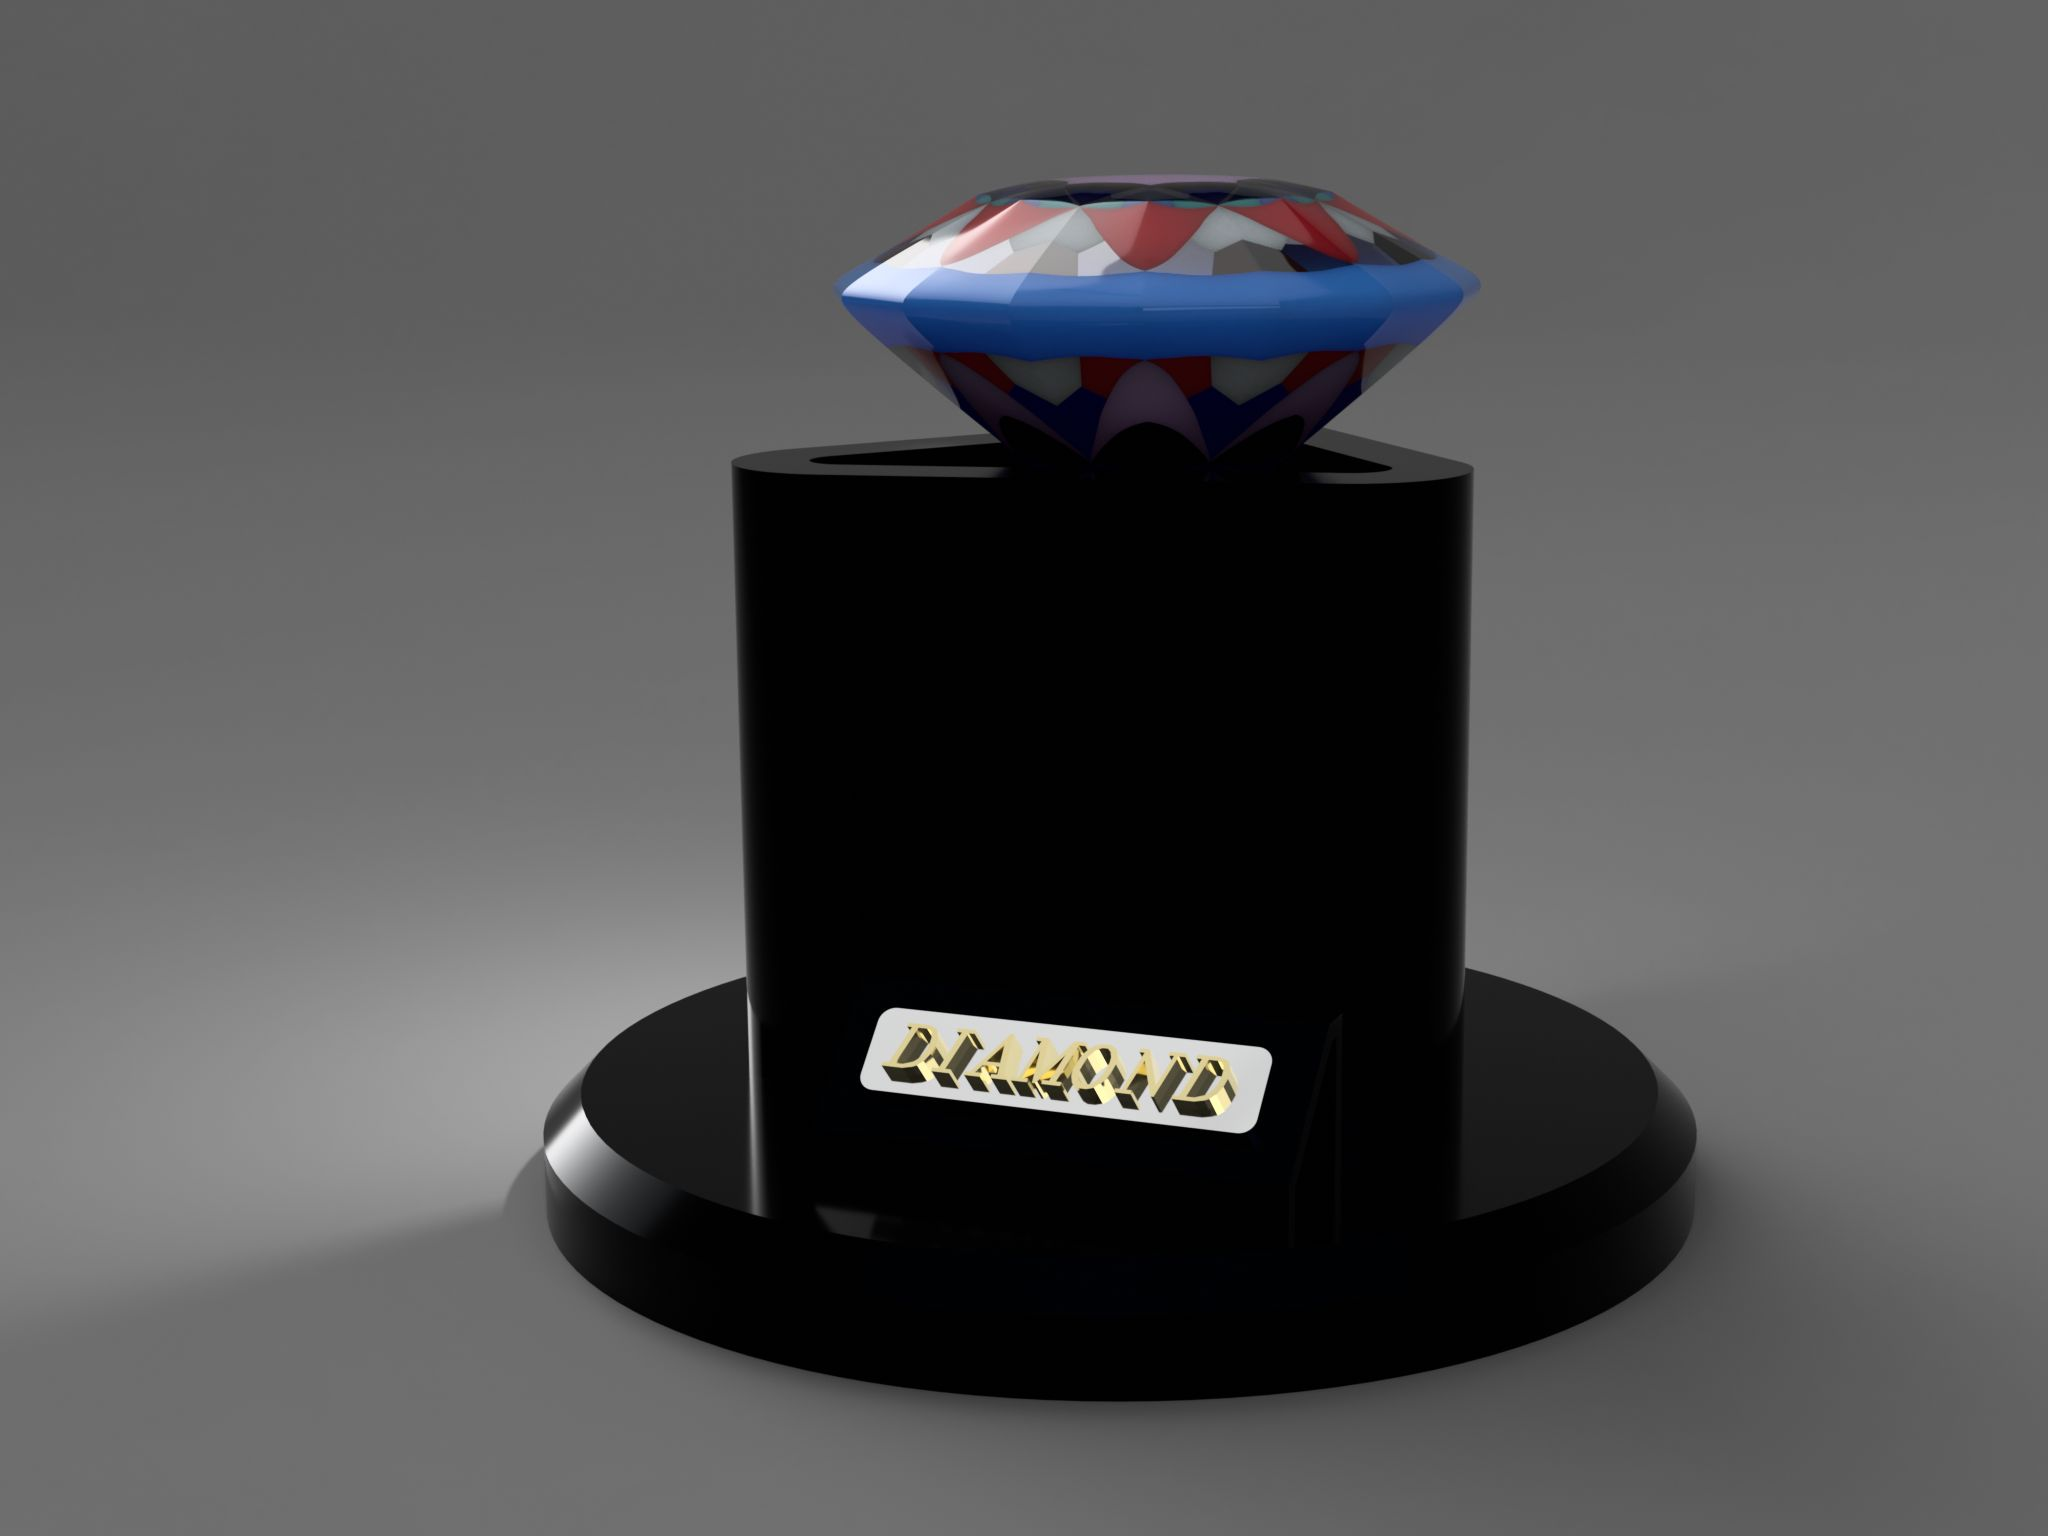 Base-con-diamante-2017-jul-25-07-52-37pm-000-customizedview822493888-3500-3500